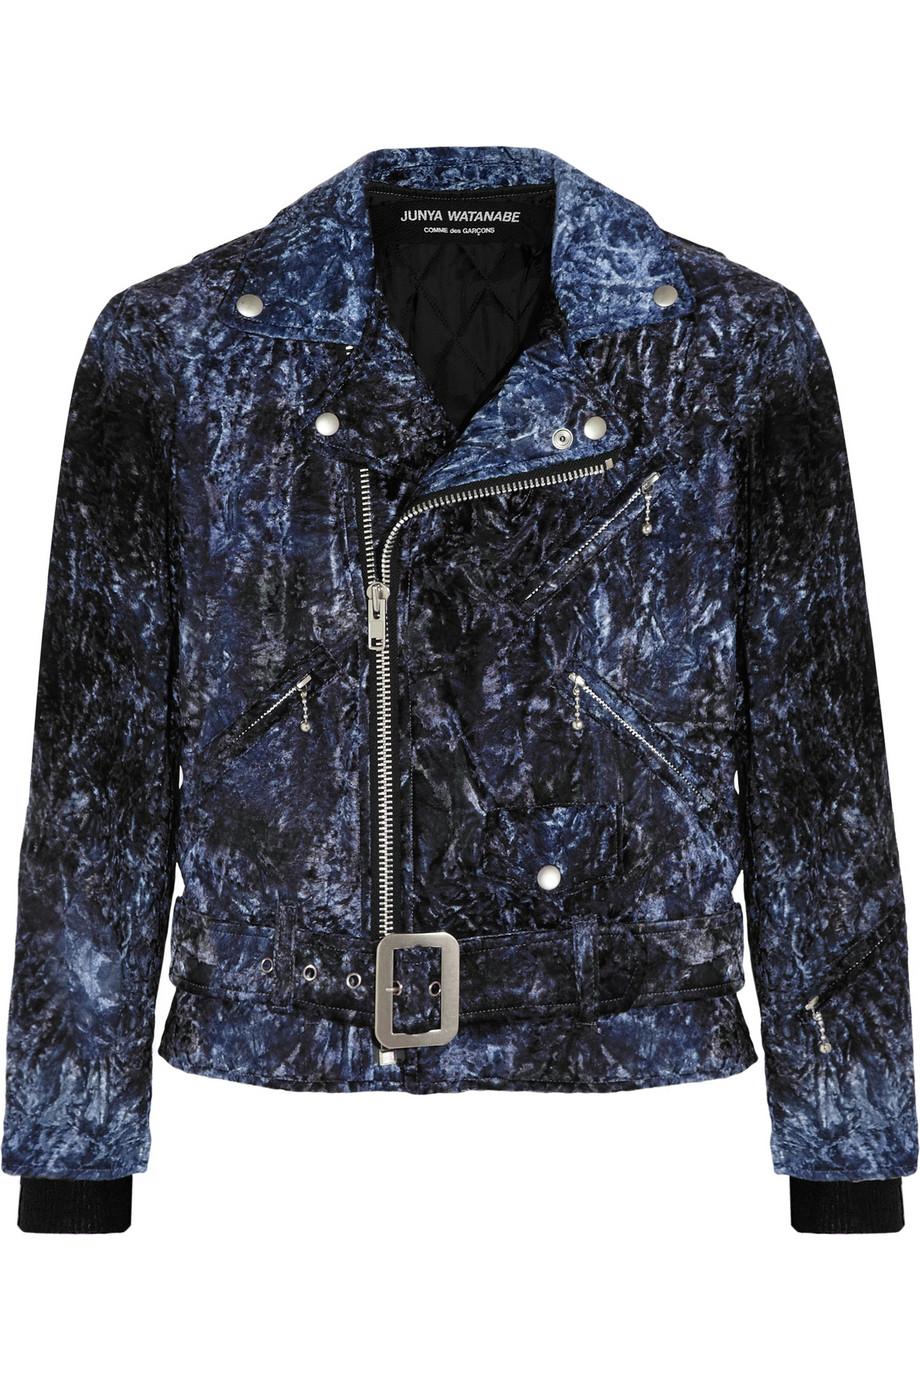 JUNYA WATANABE Dark-blue crushed-velvet